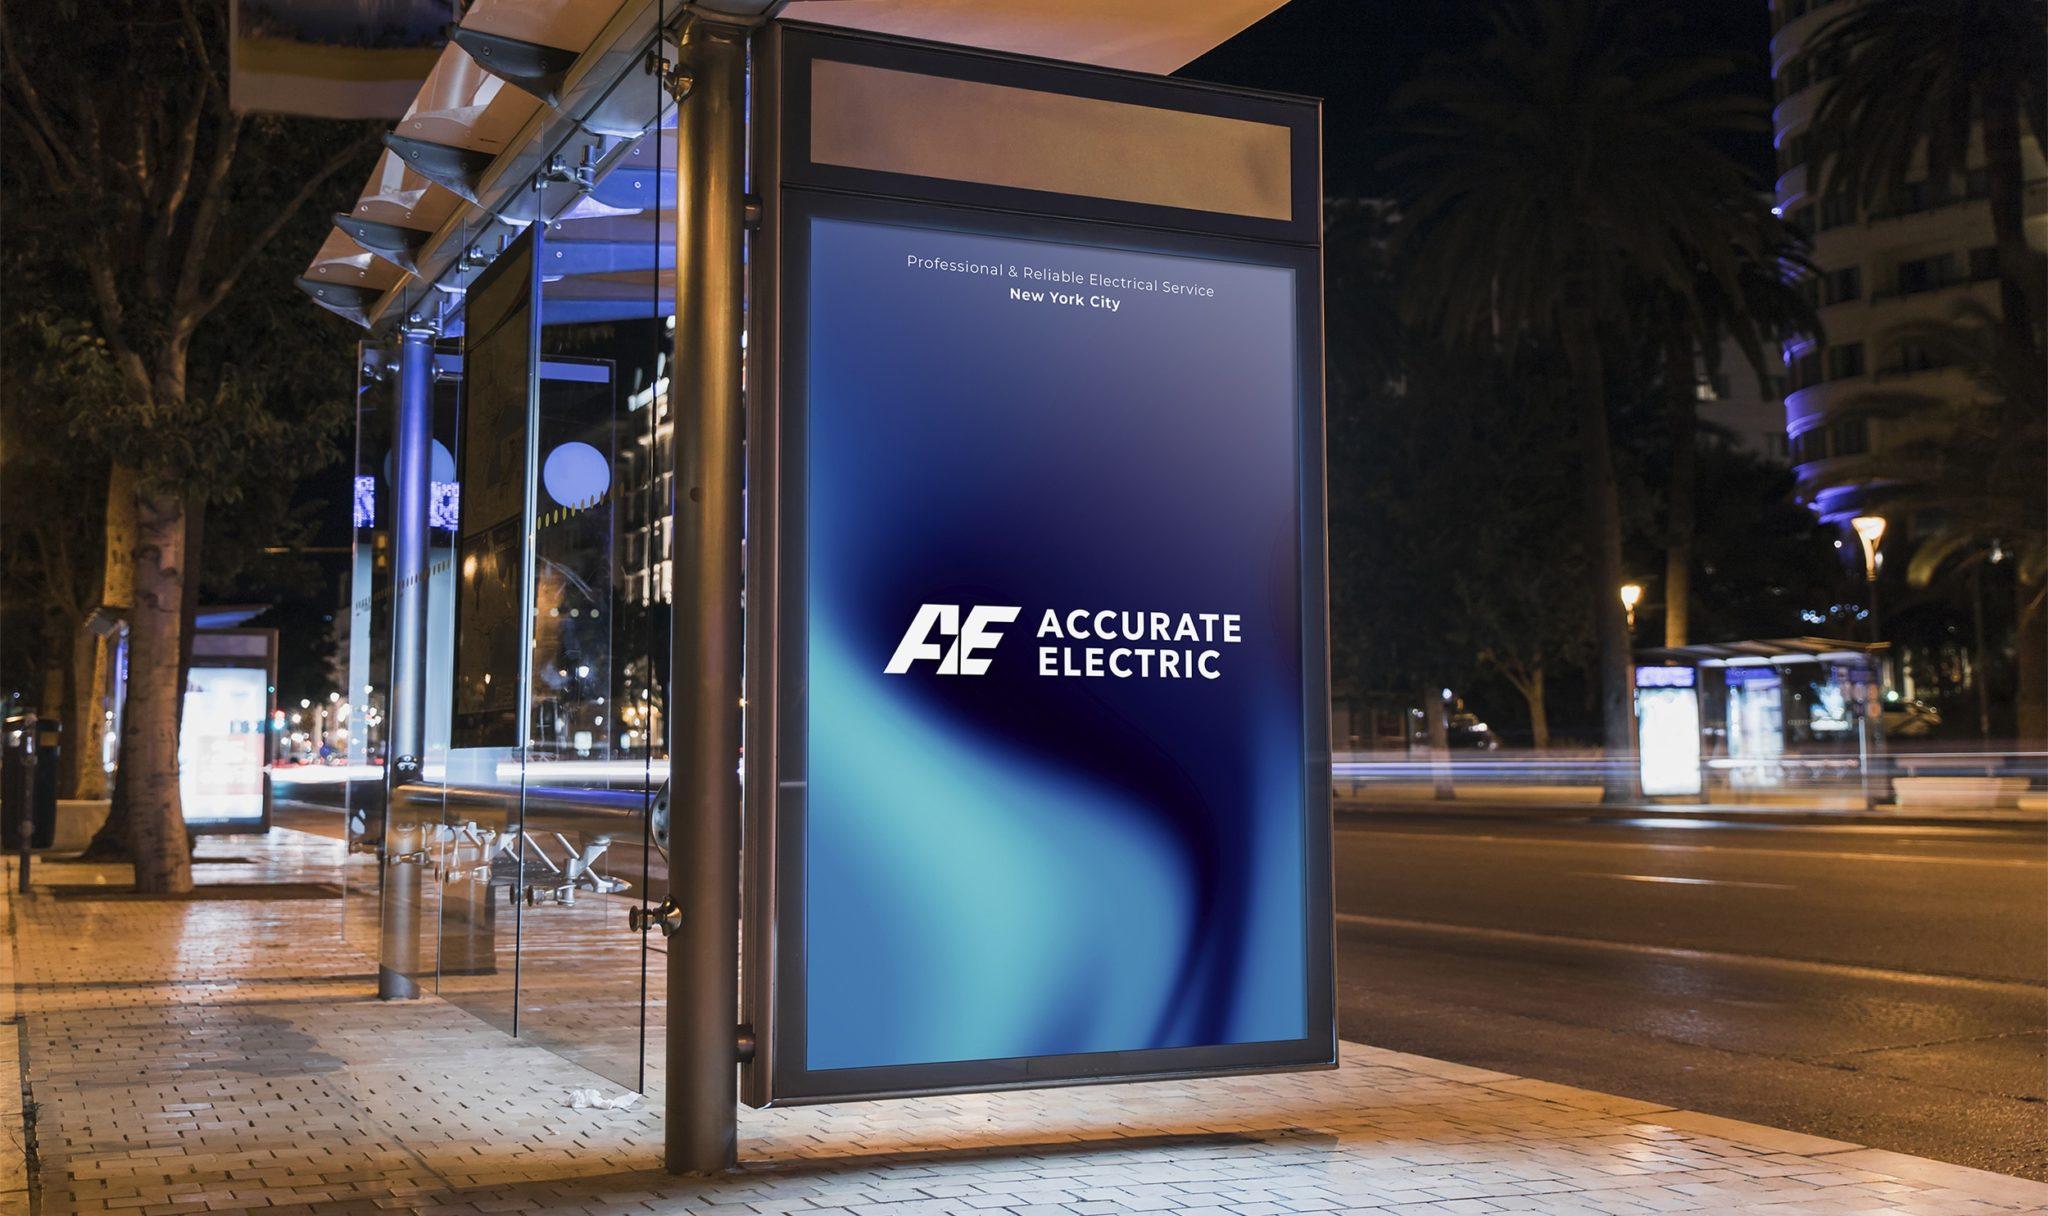 Accurate Electric Brand Identity Billboard